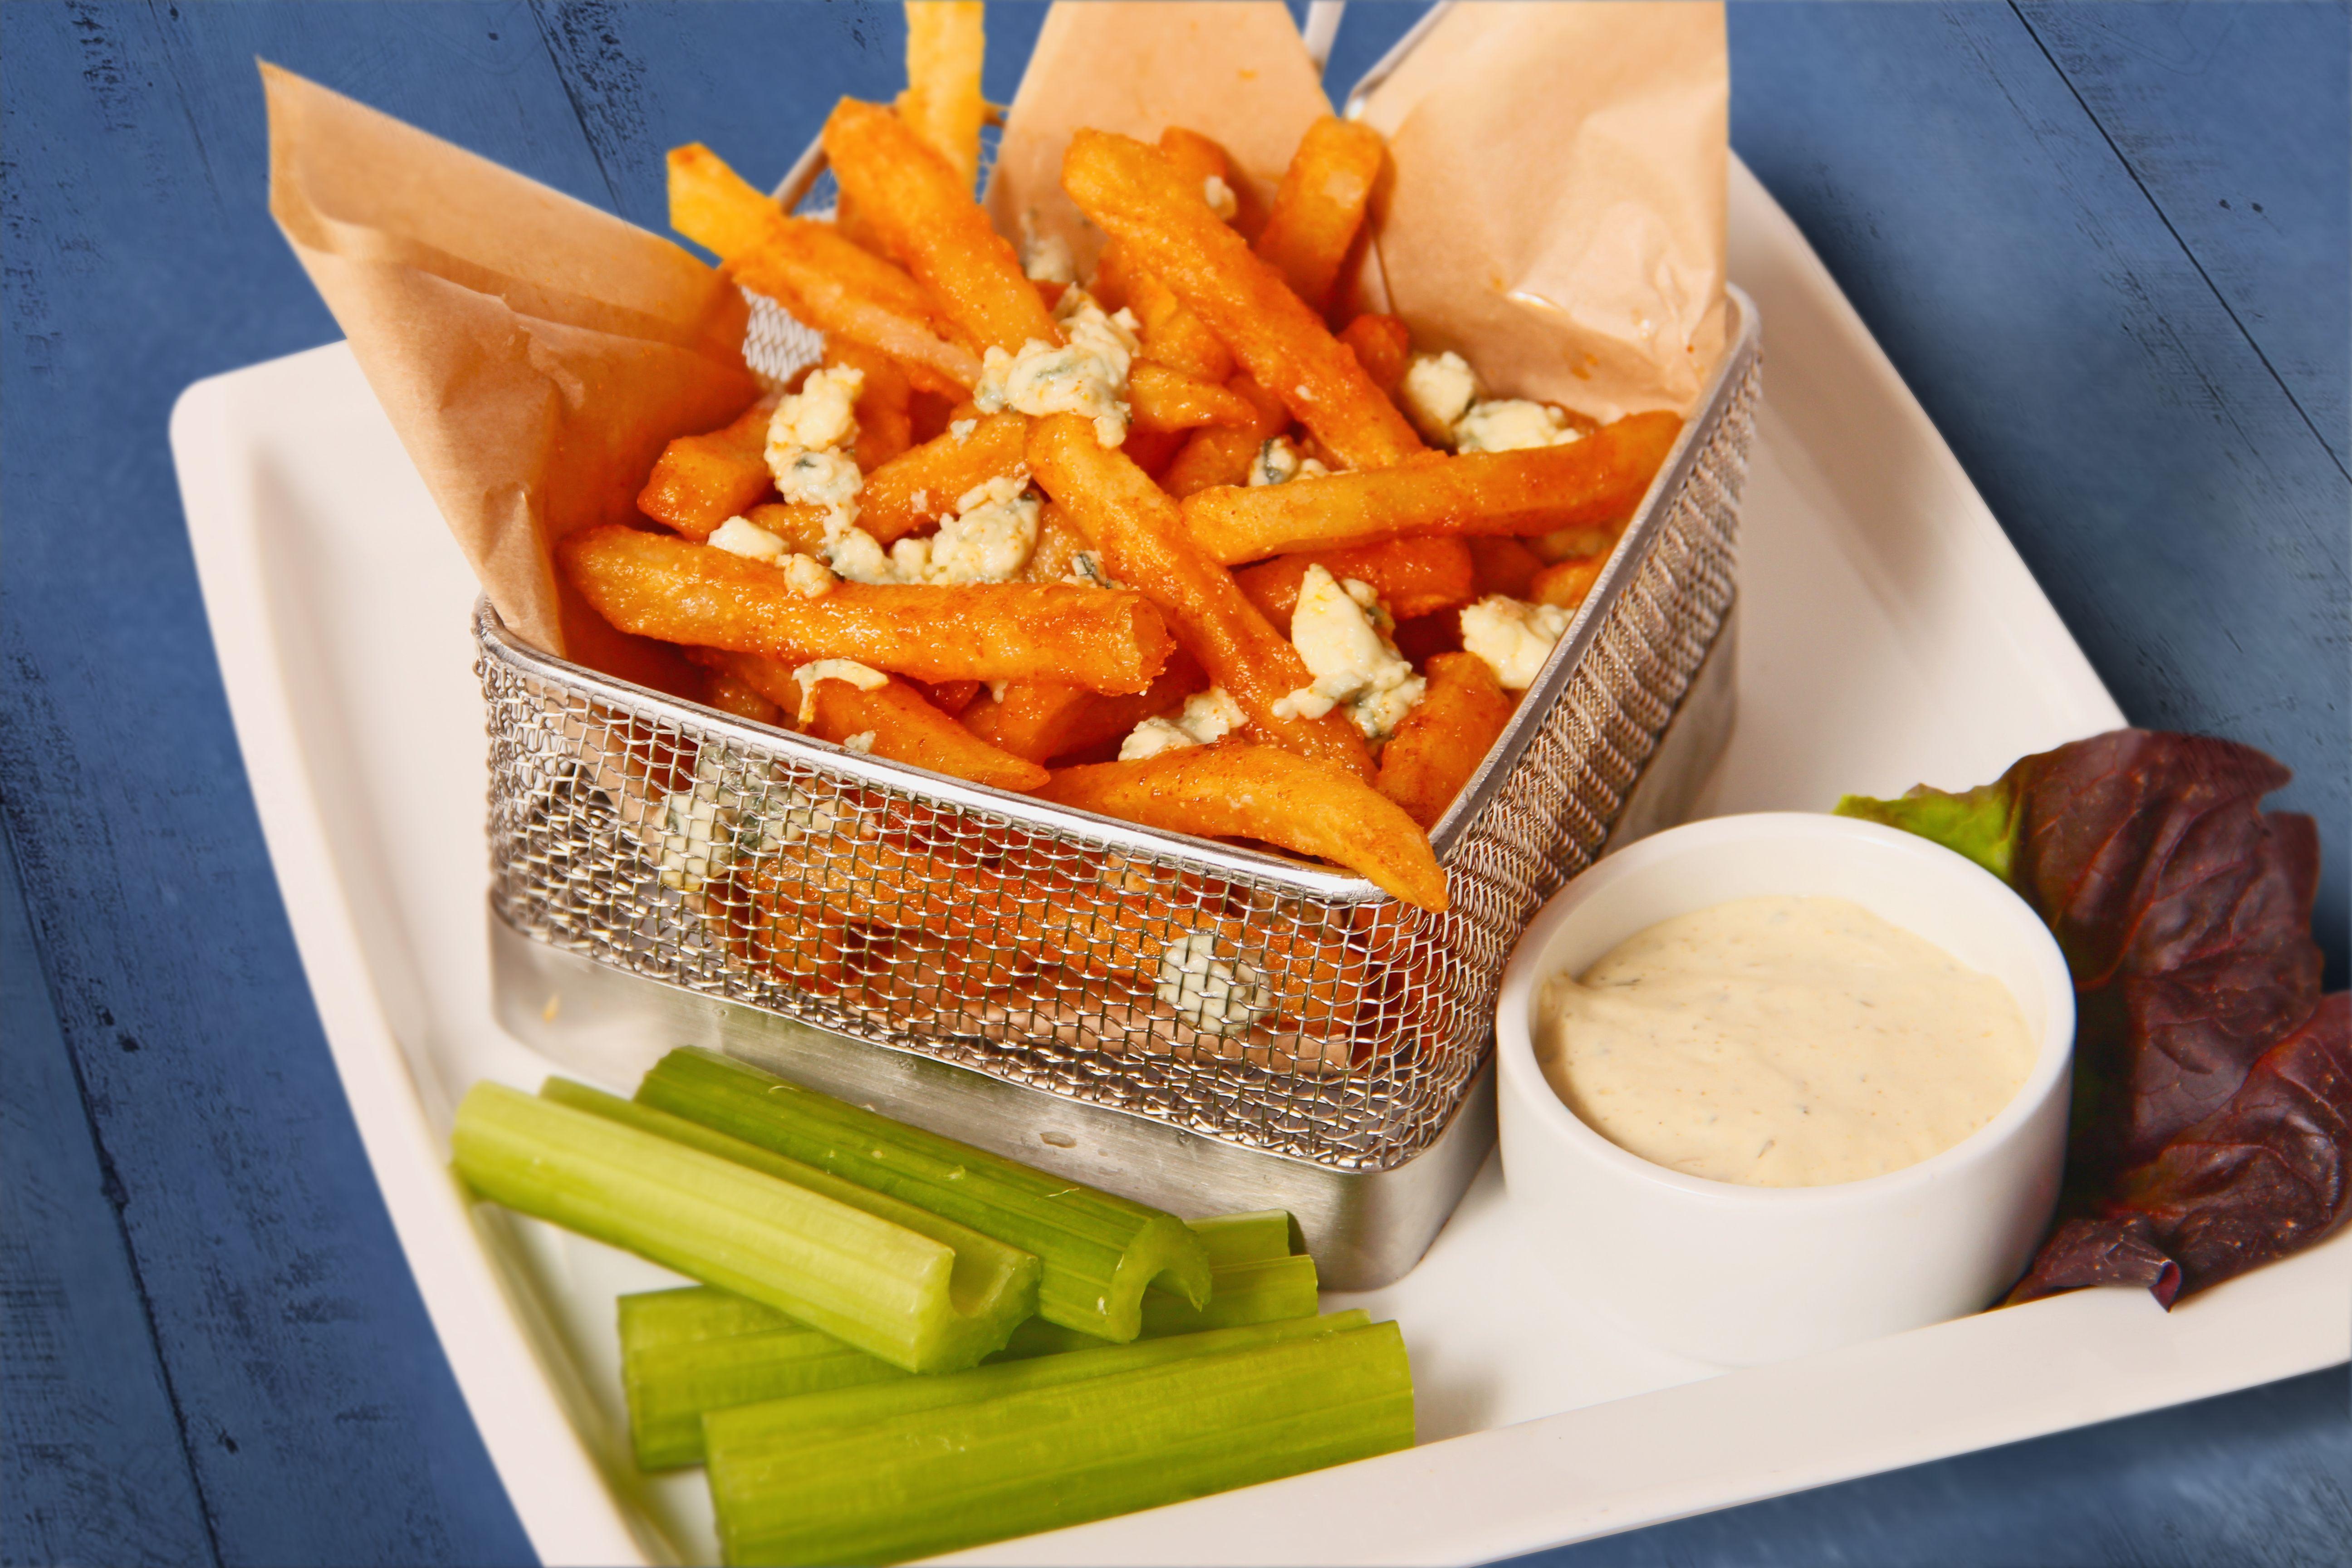 Buffalo Bleu Hot Fries Food, Fries, Hot